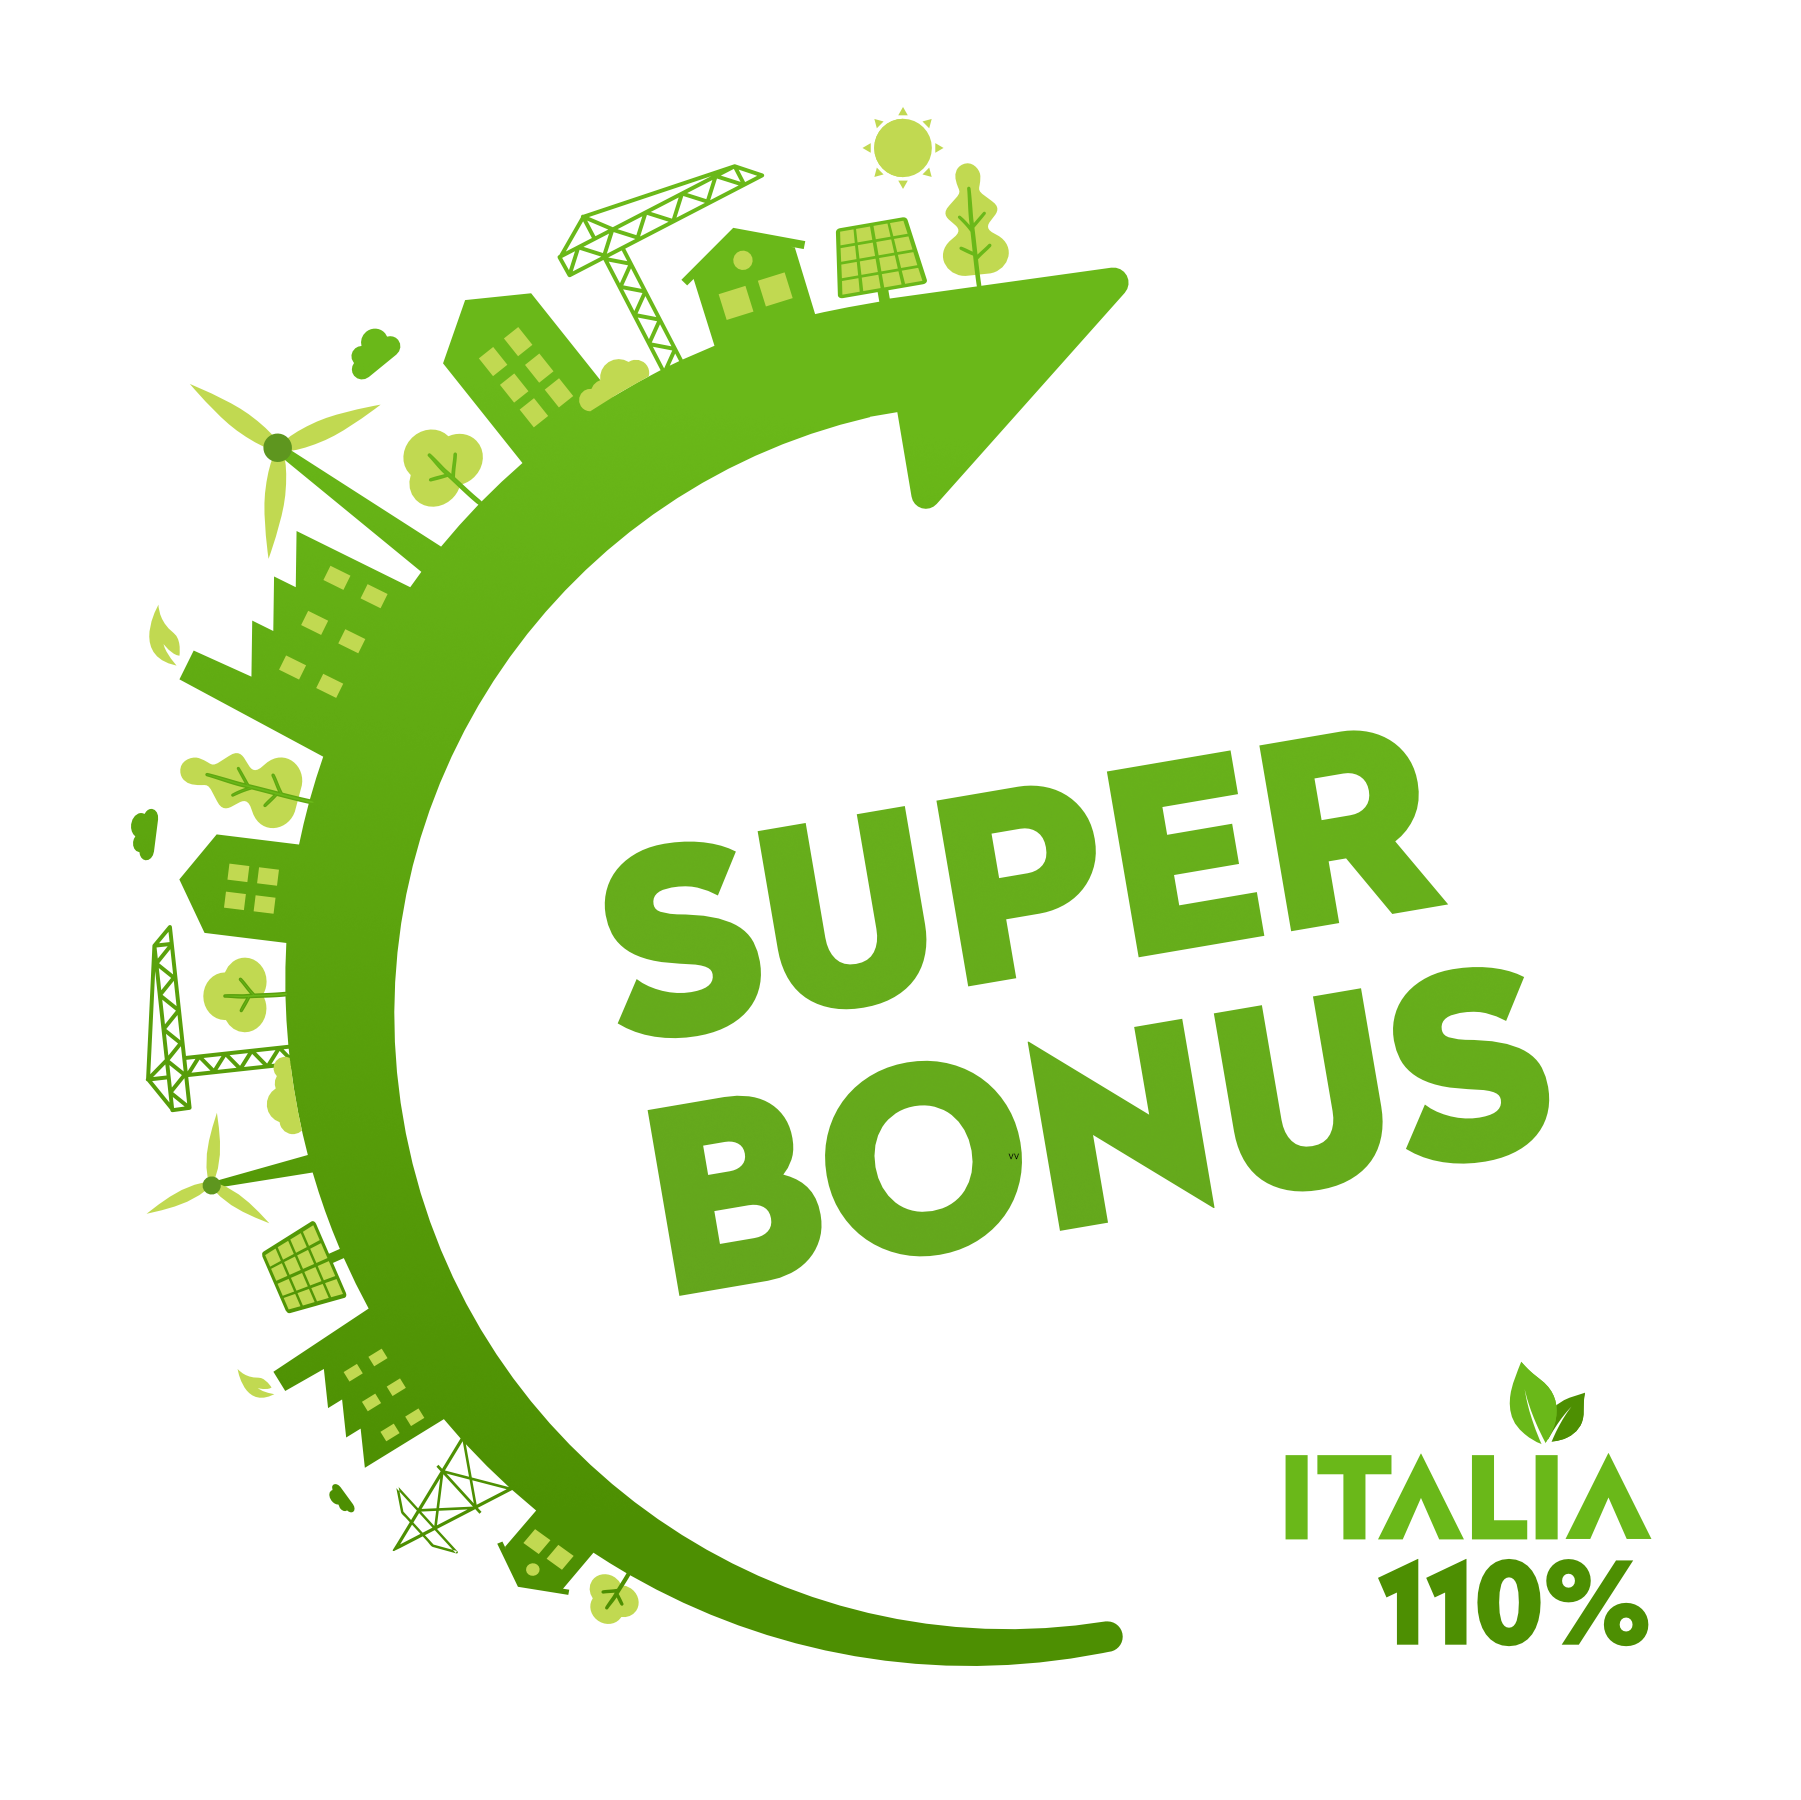 Superbonus: ecobonus e sismabonus potenziati al 110%